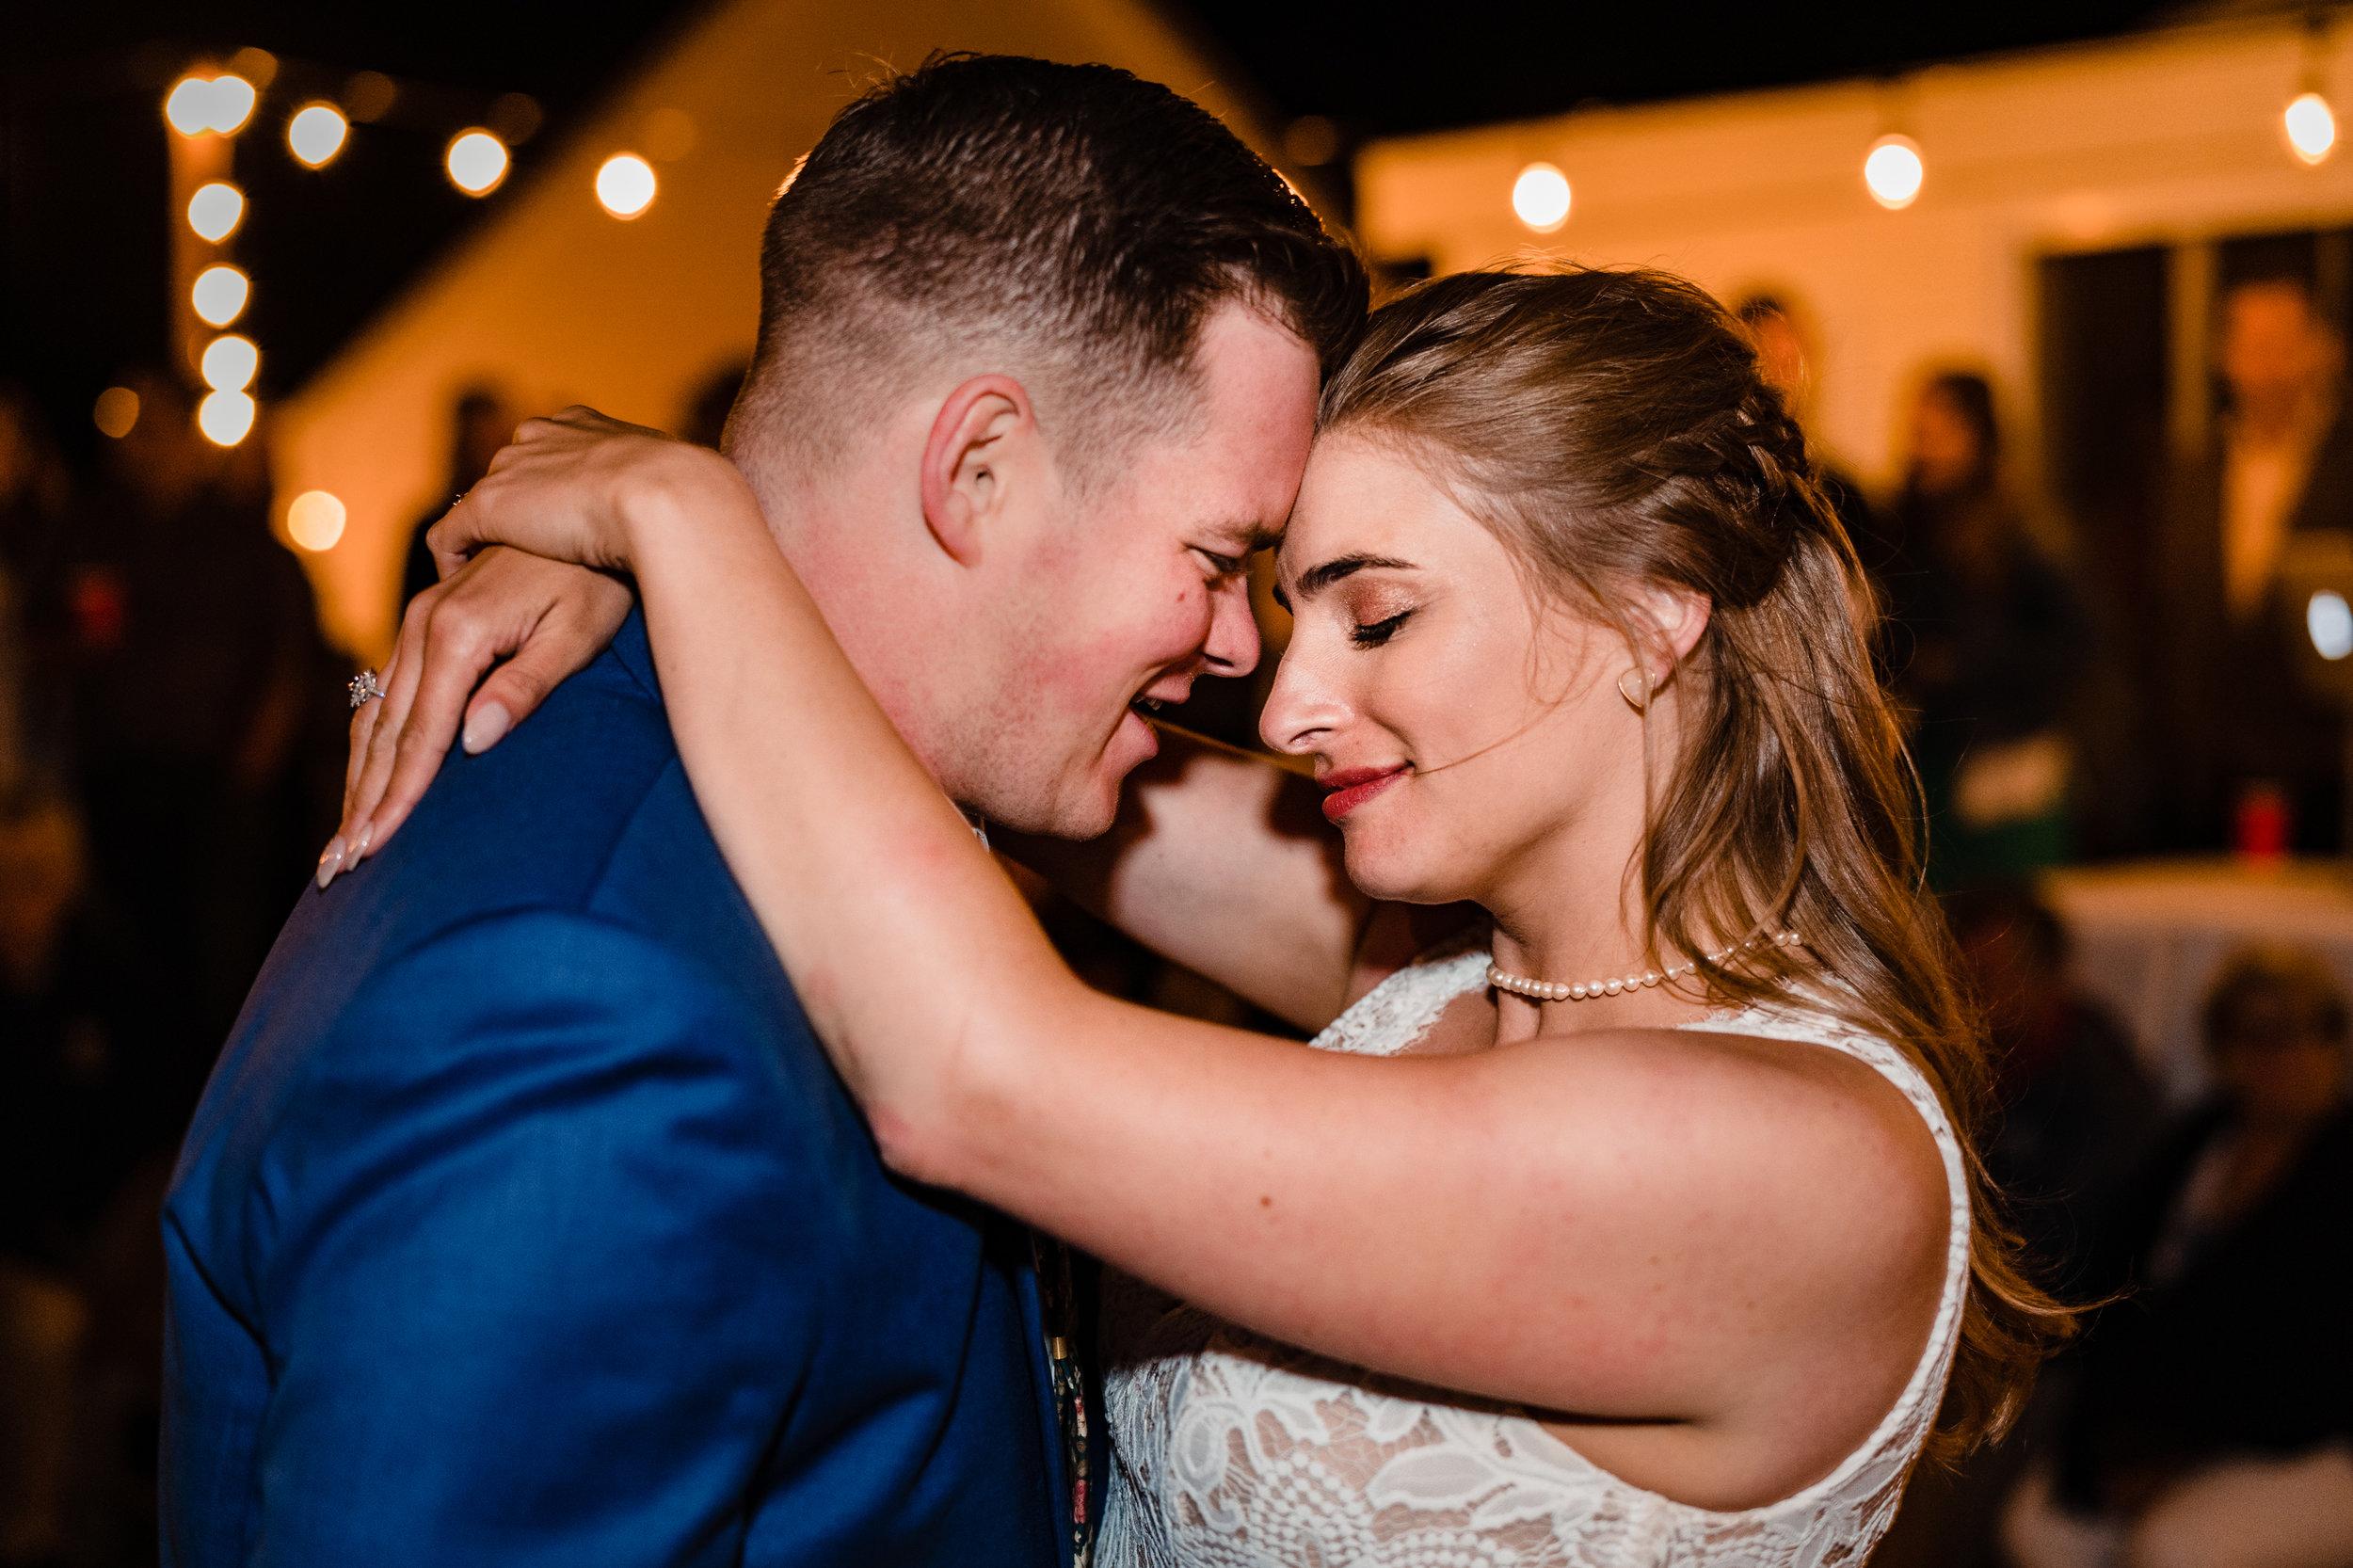 Janelle-Mitch-Halifax-Wedding-Nova-Scotia-Photography (152 of 163).jpg